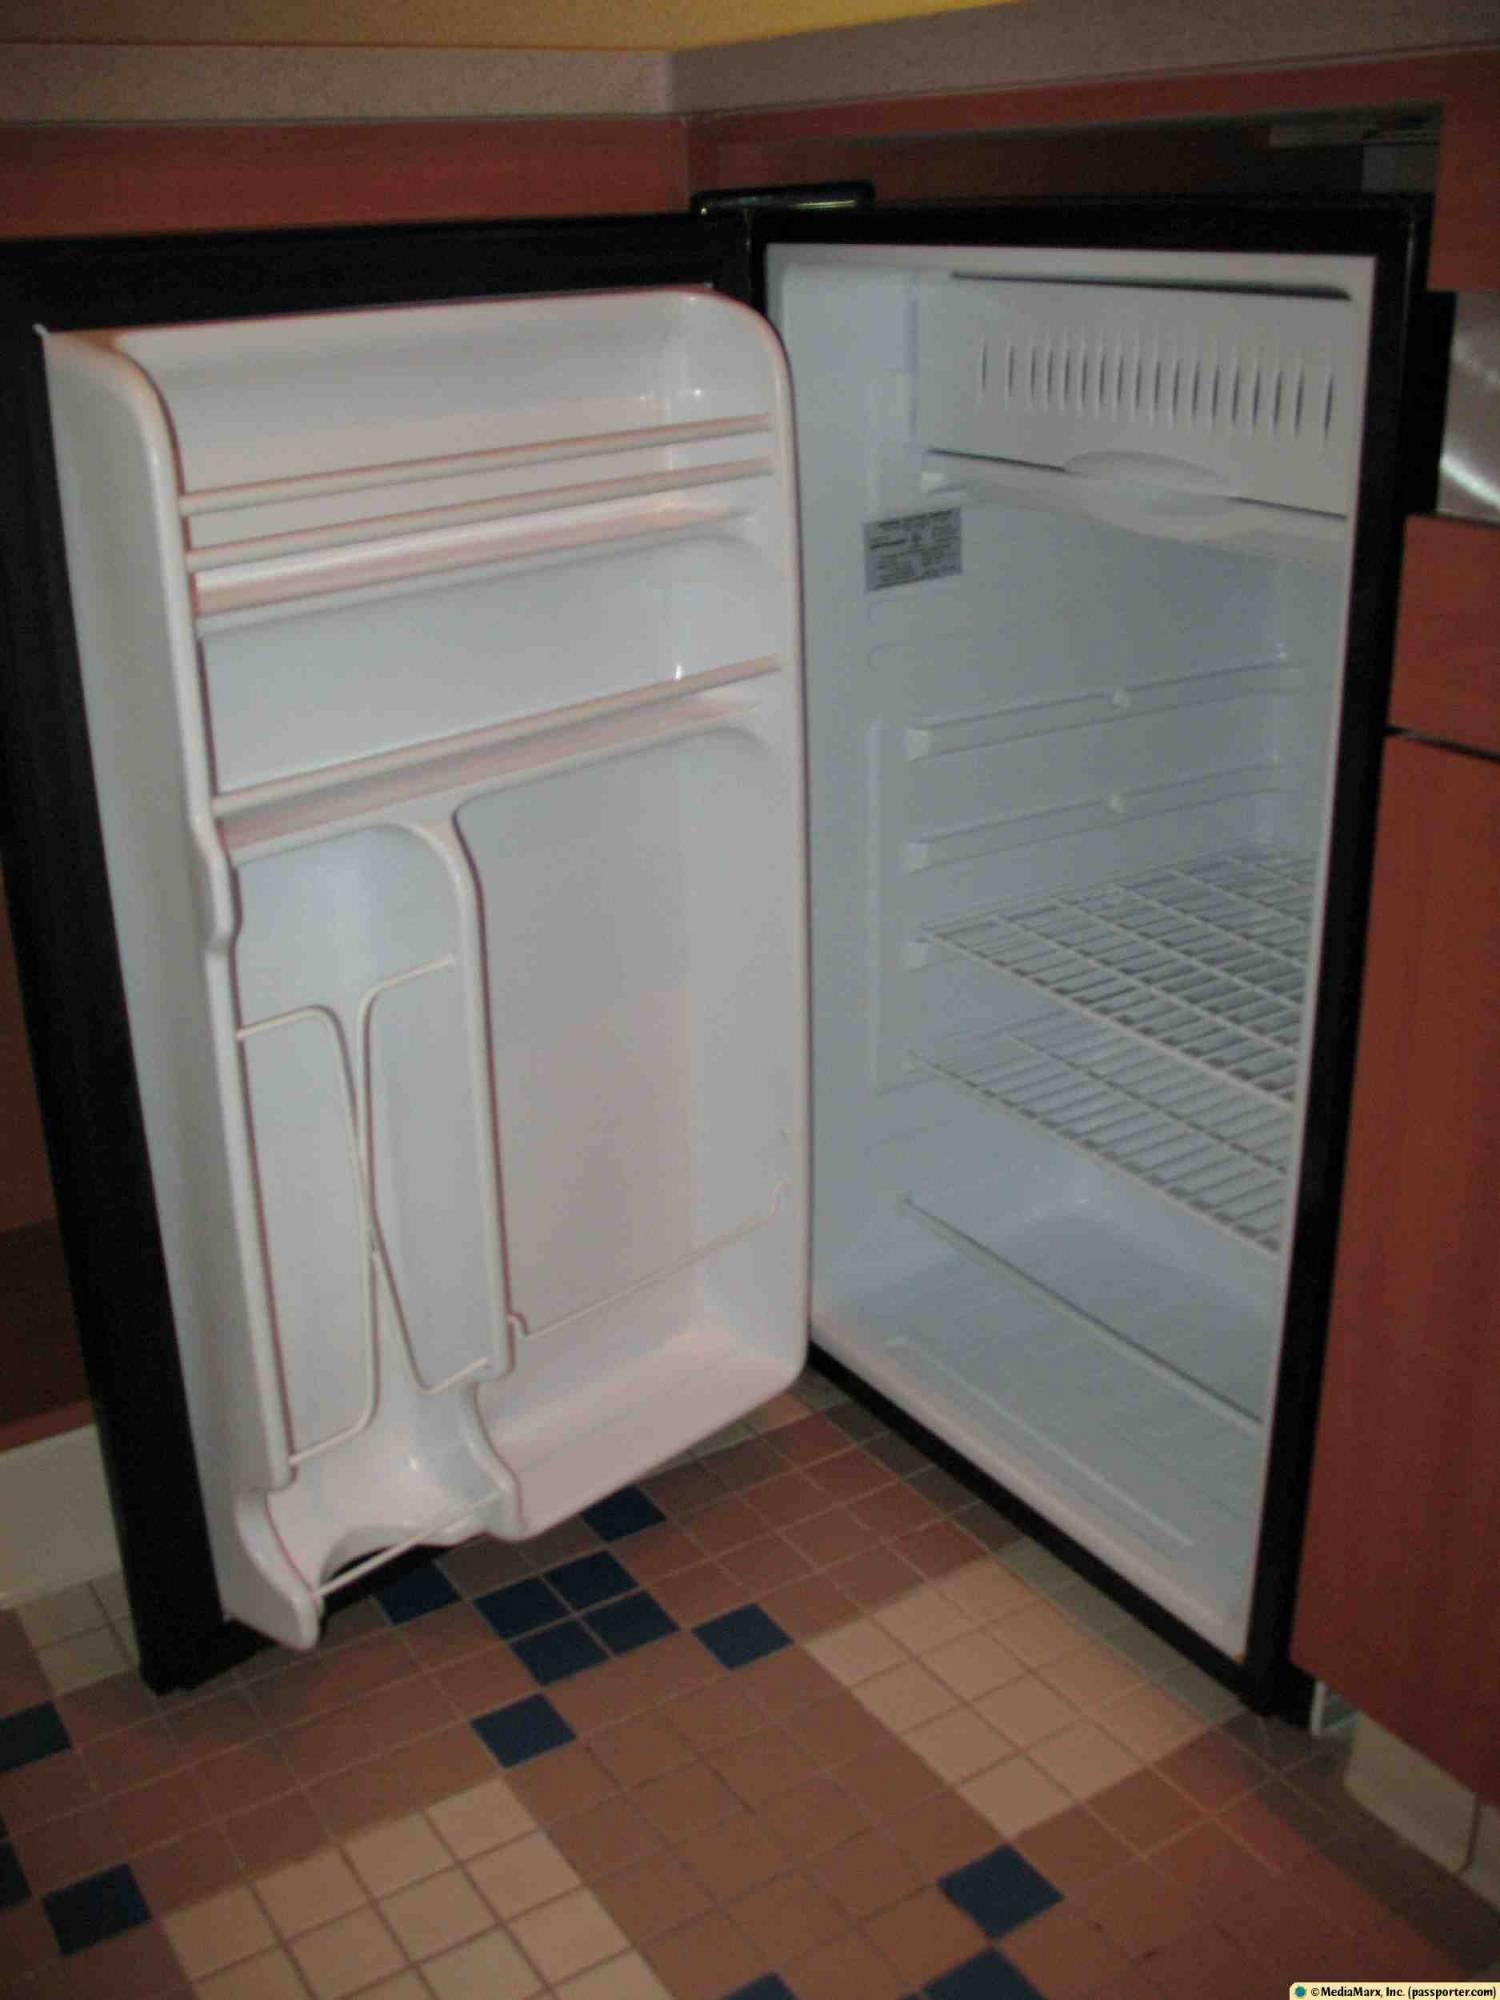 All Star Music Family Suite Refrigerator Passporter Photos